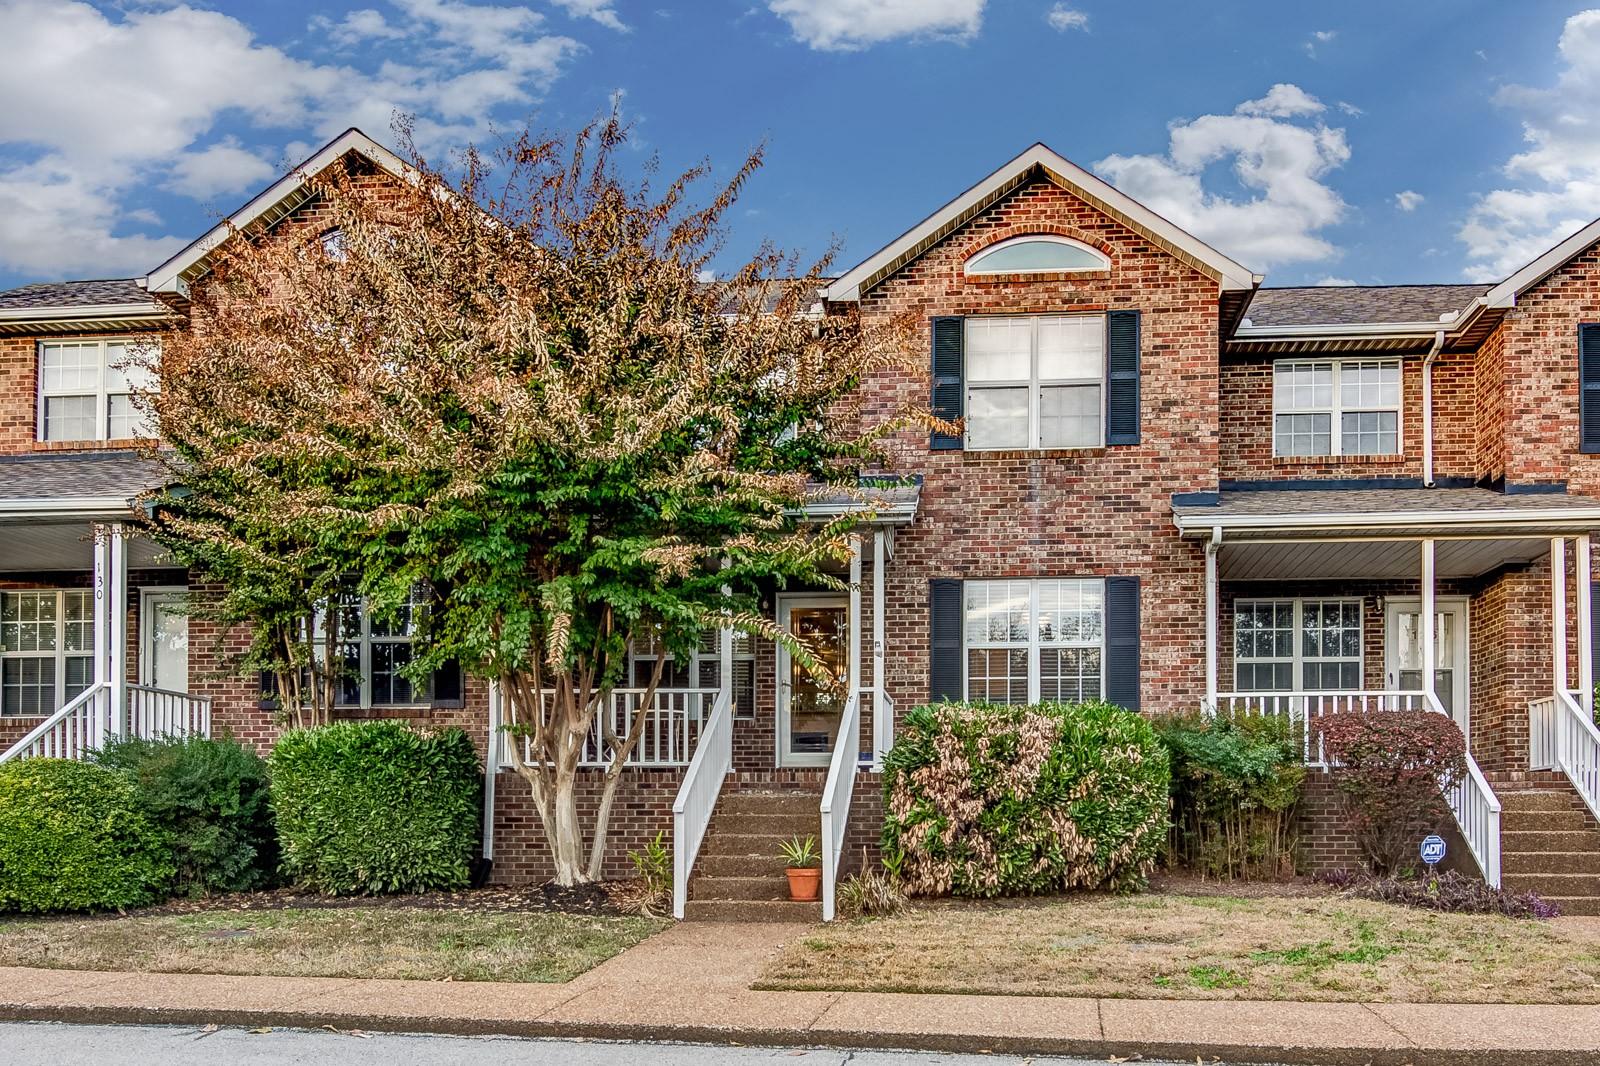 128 Pepper Ridge Cir, Nashville-Antioch in Davidson County County, TN 37013 Home for Sale